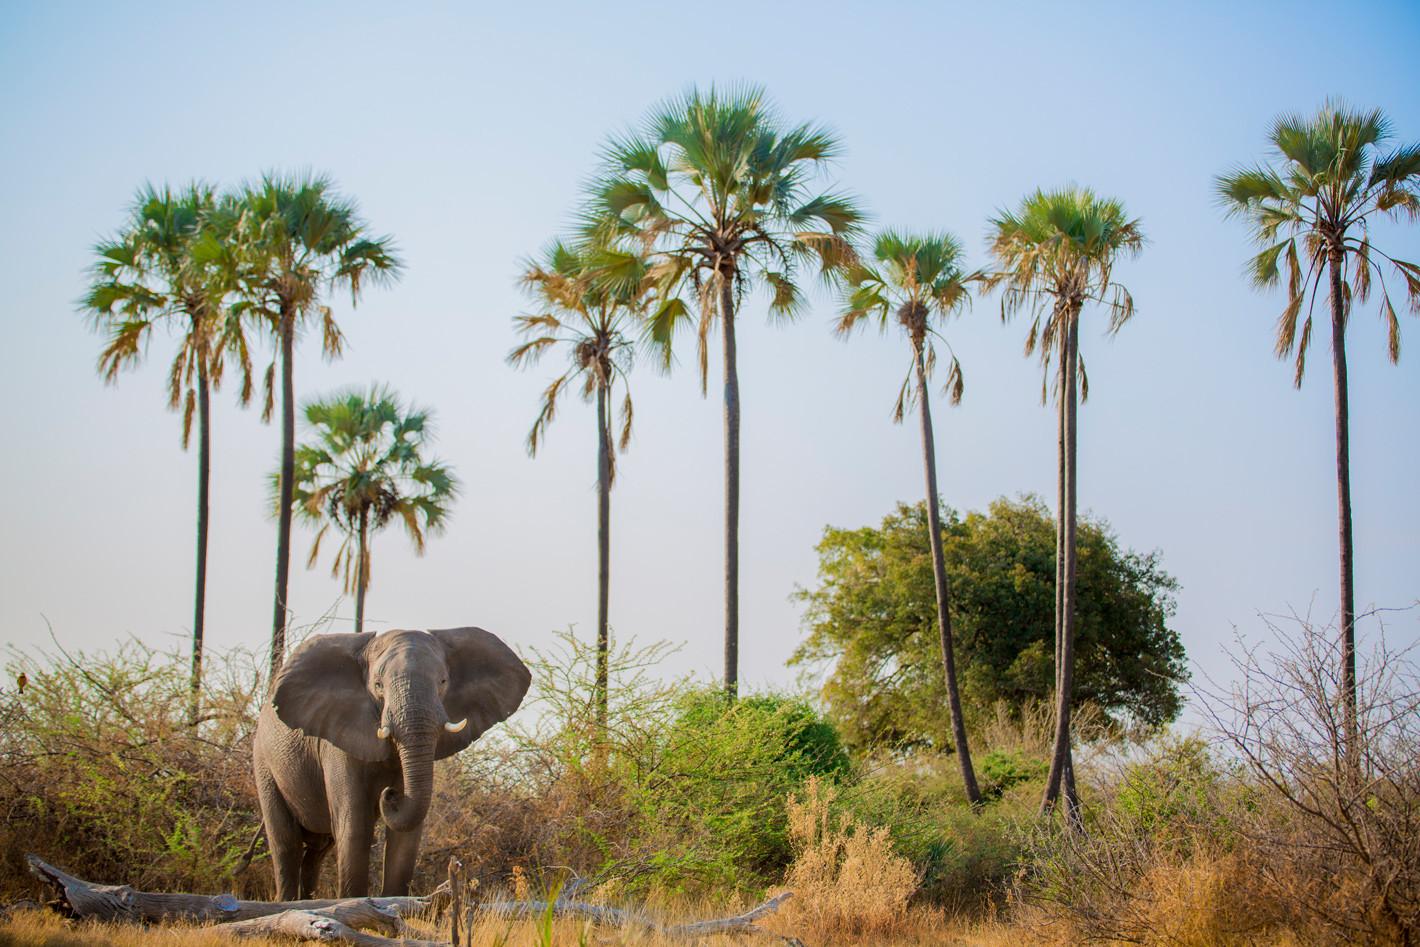 plam-trees-elephant